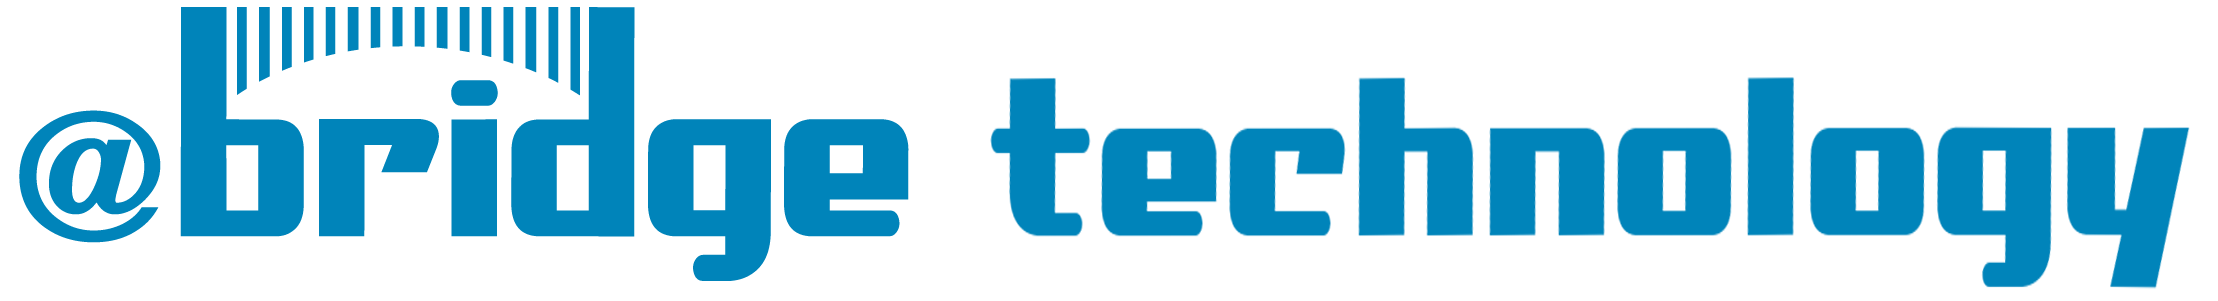 @bridge technology | アットブリッジテクノロジー